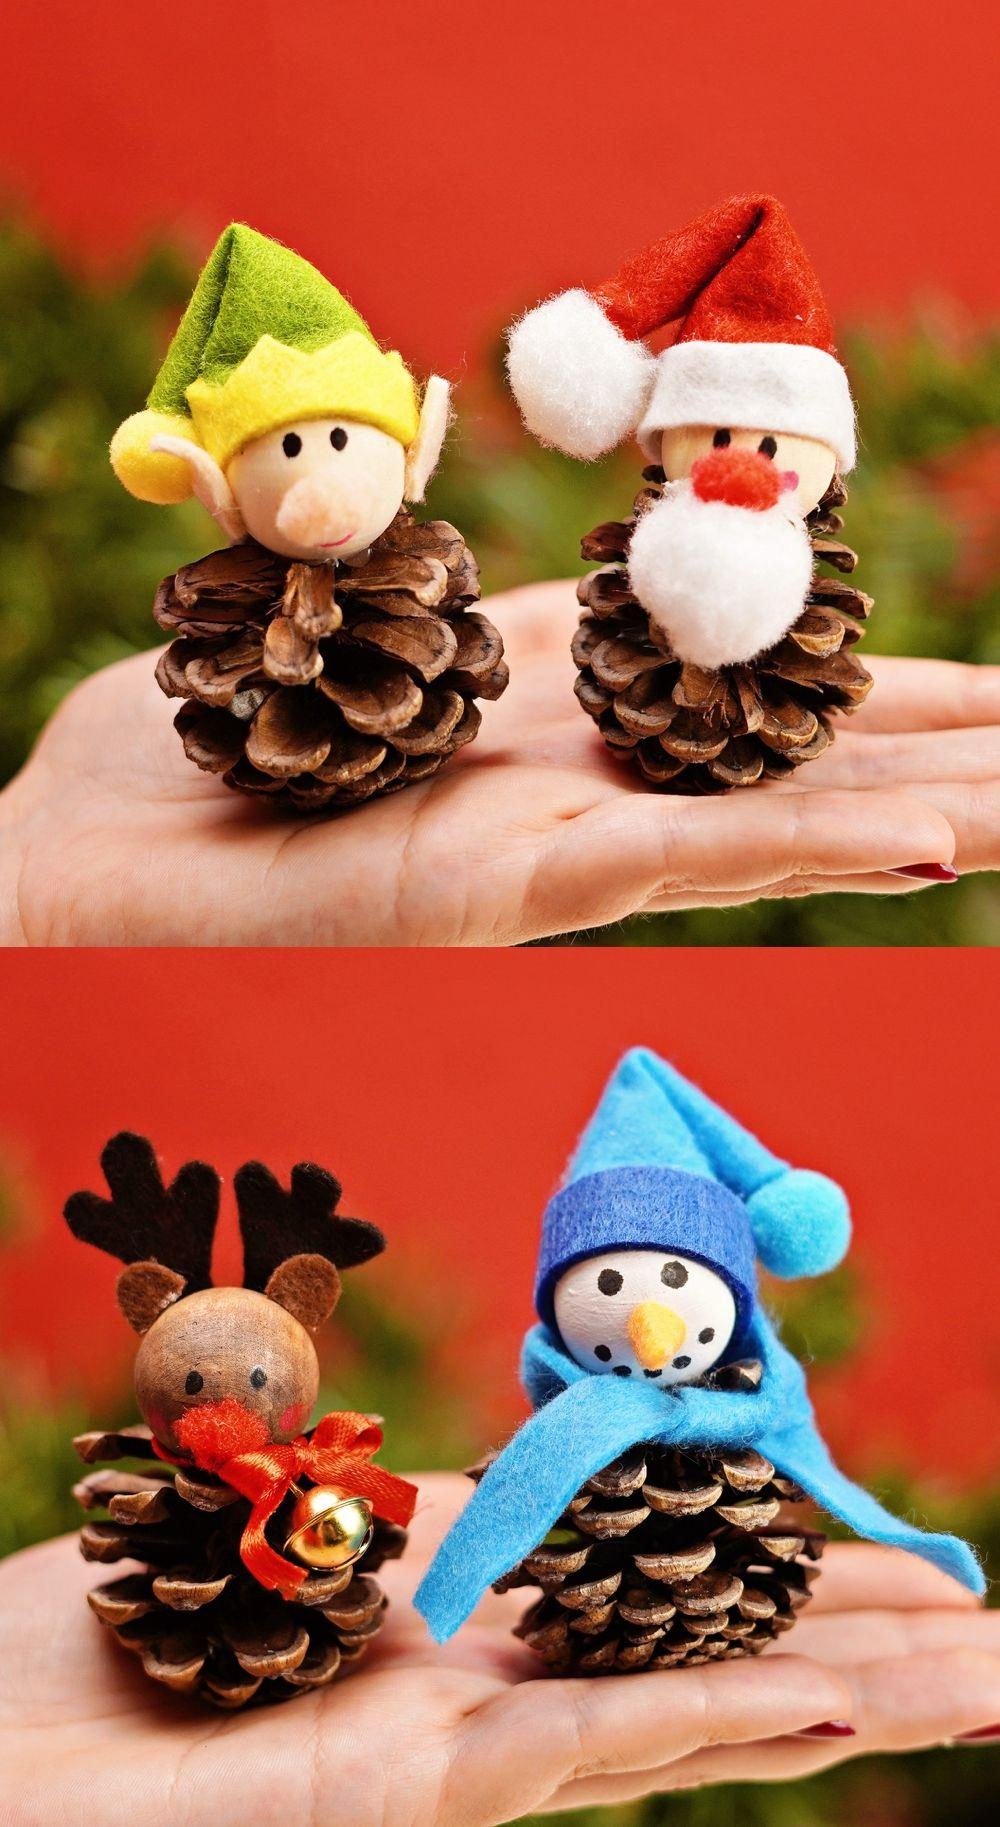 Pine Cone Christmas Craft Best Pine Cone Crafts Pine Cone Crafts Christmas Crafts Cones Crafts